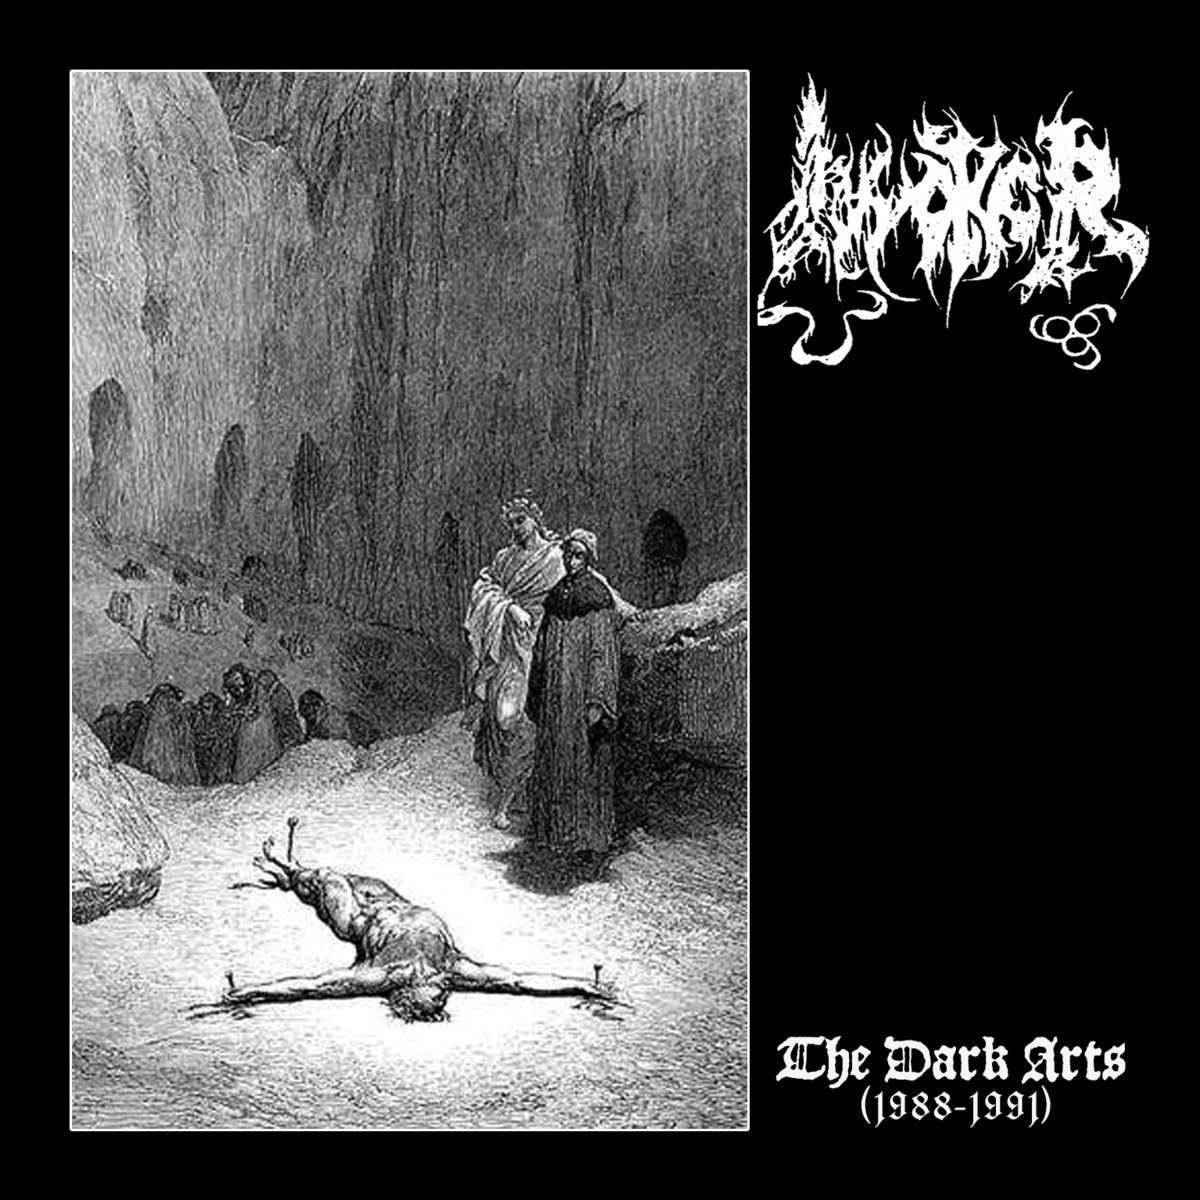 Invoker : The Dark Acts (1988-1991)